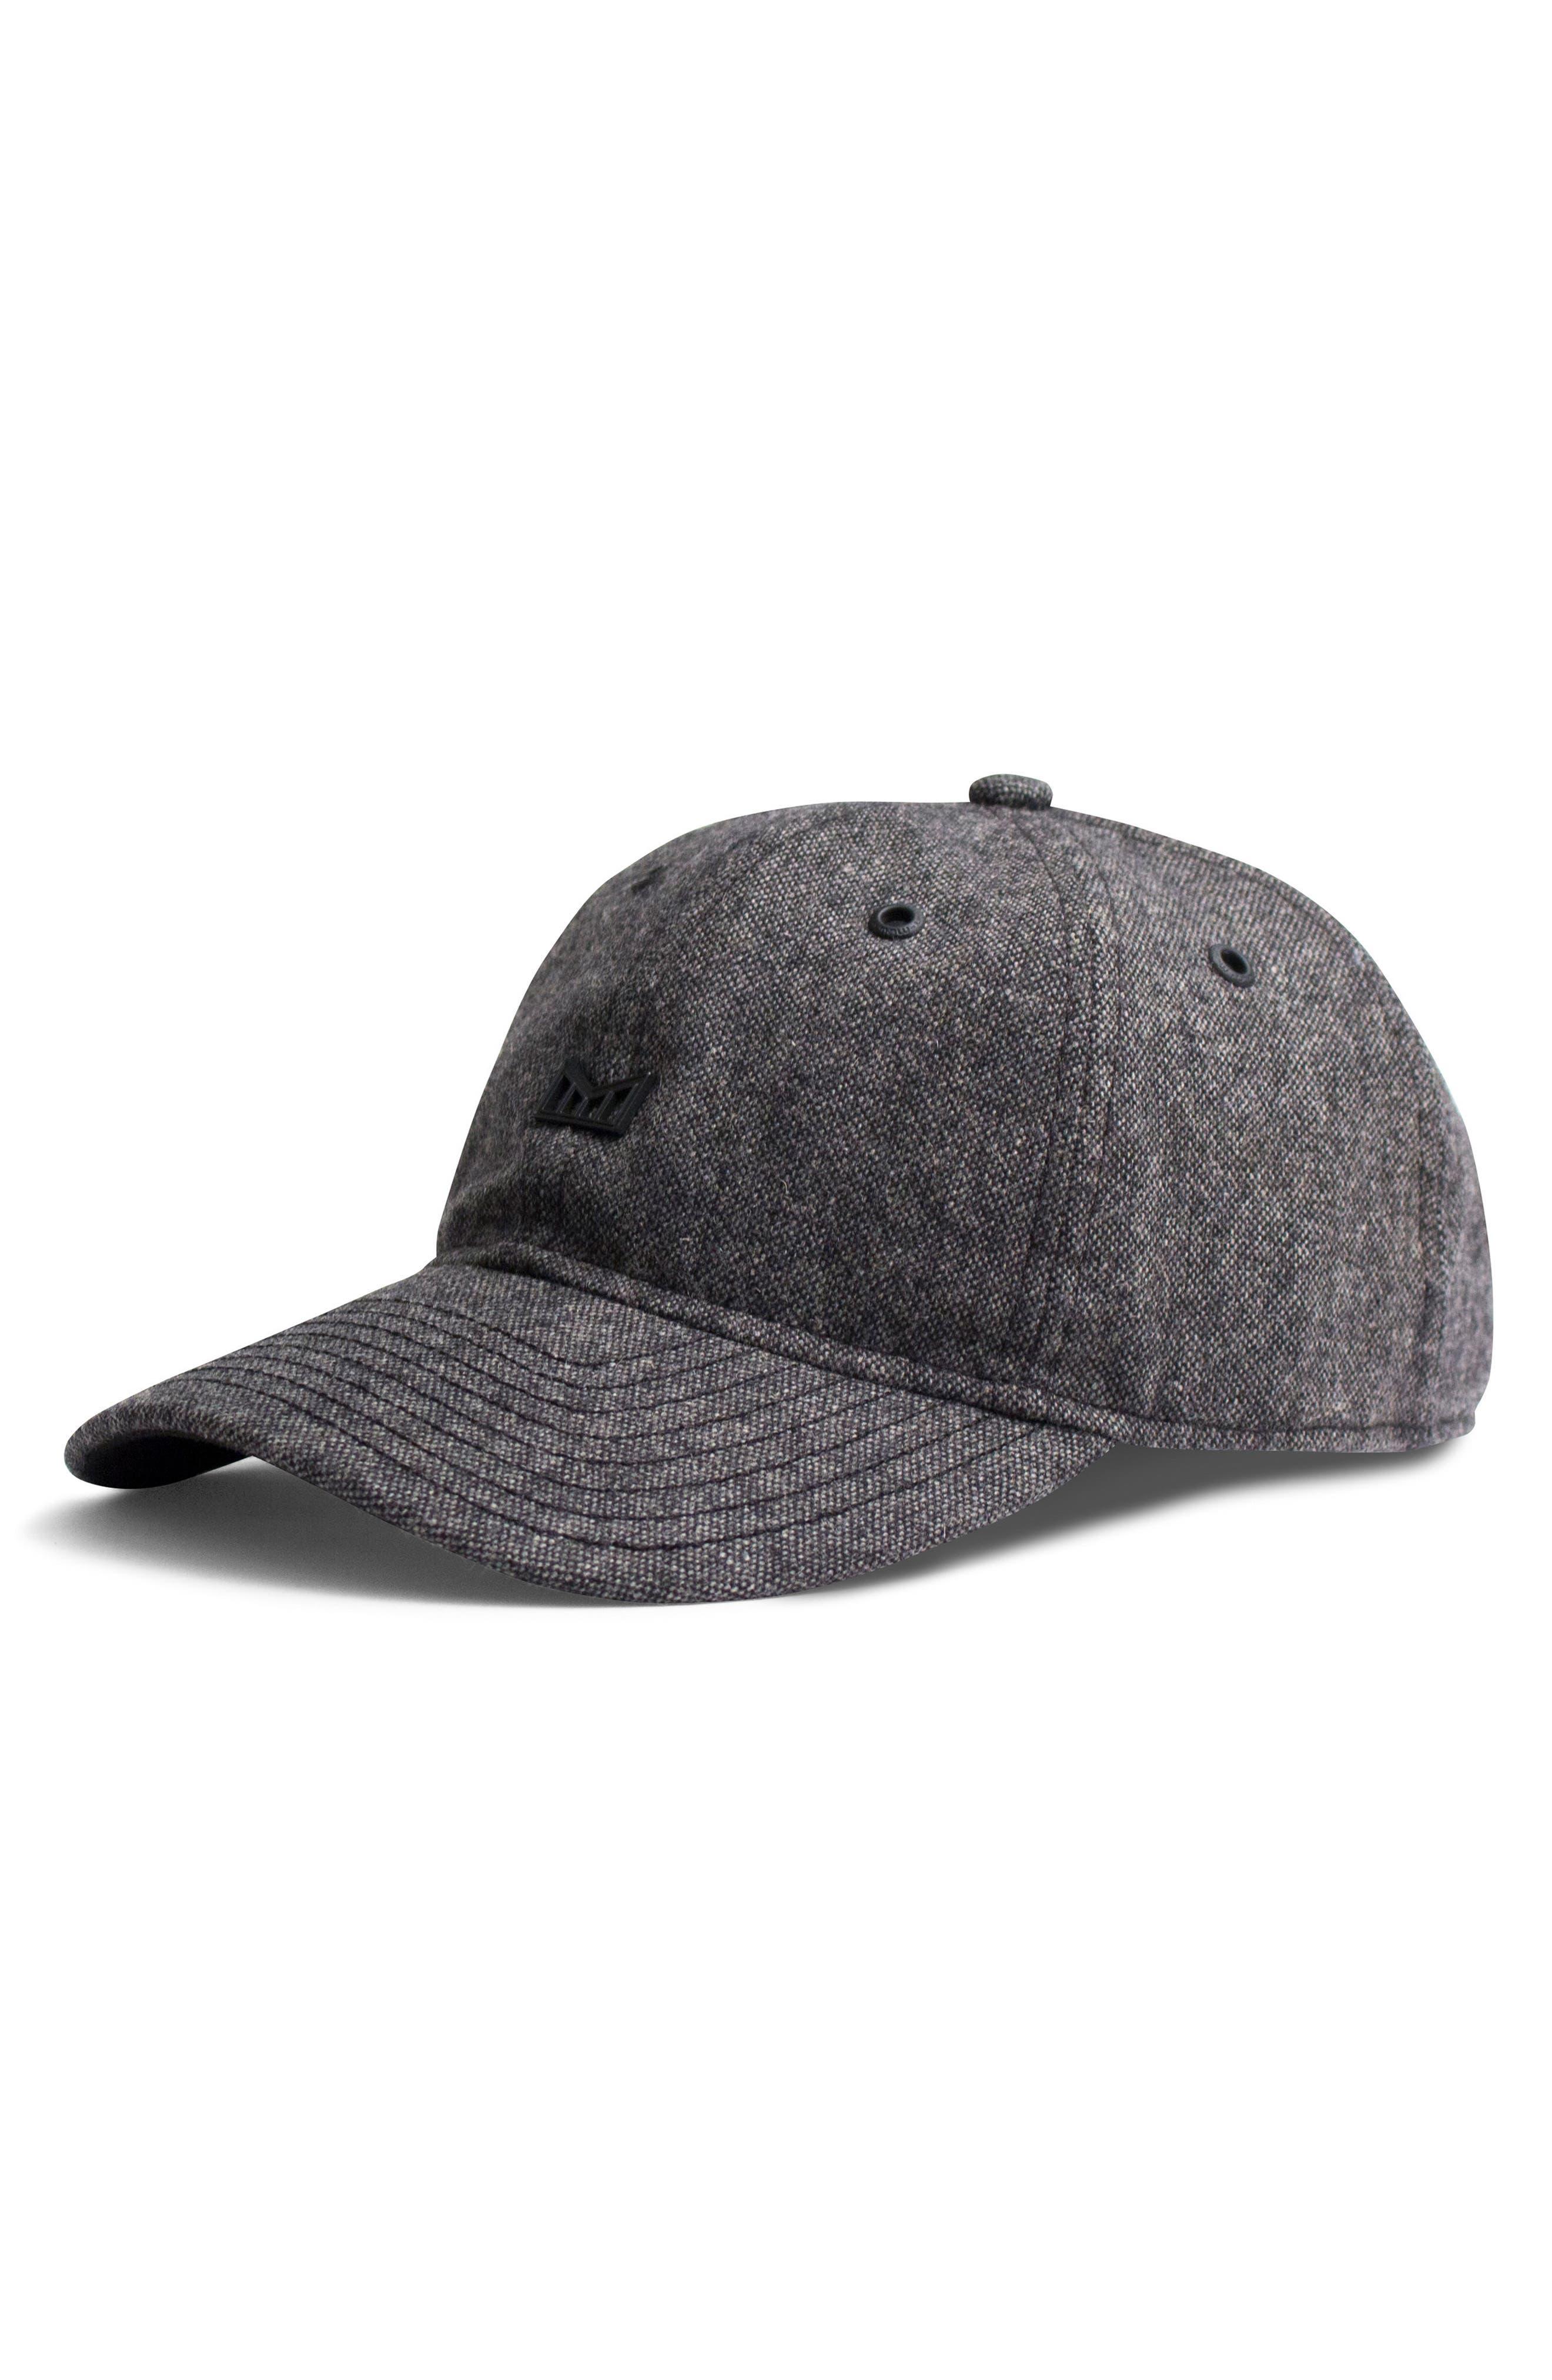 Skunked Baseball Cap,                             Main thumbnail 1, color,                             BLACK